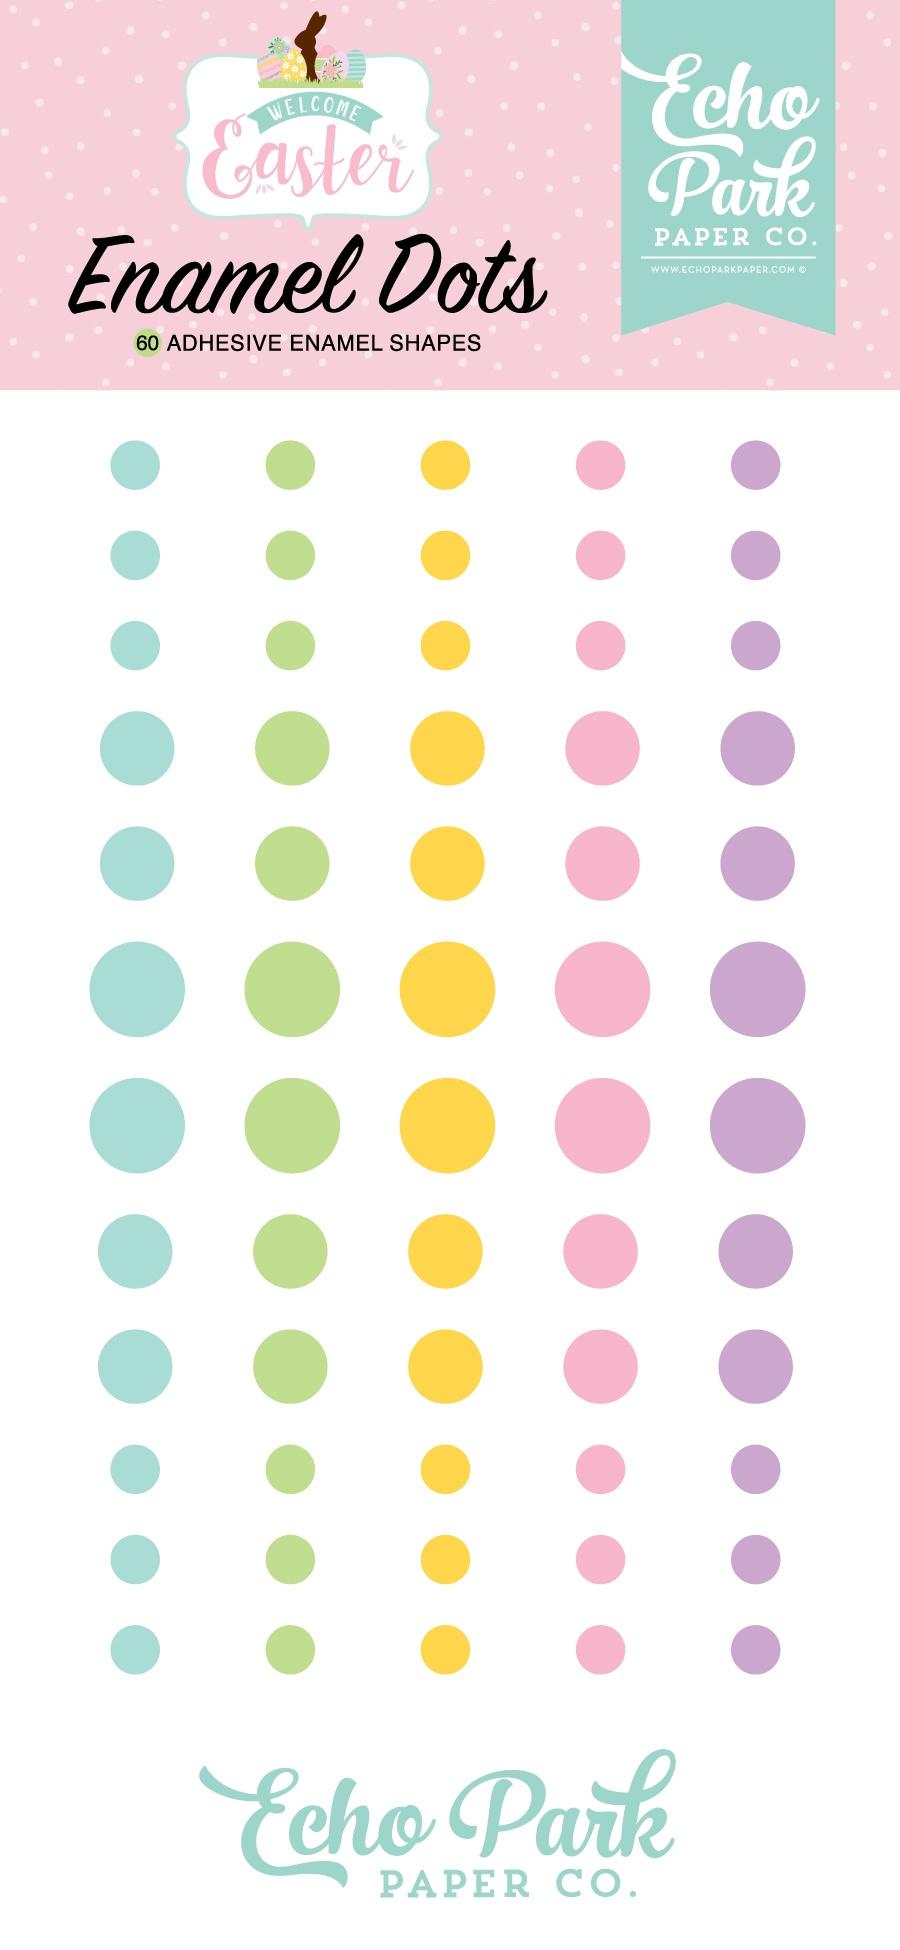 Echo Park Adhesive Enamel Dots 60/Pkg-Welcome Easter